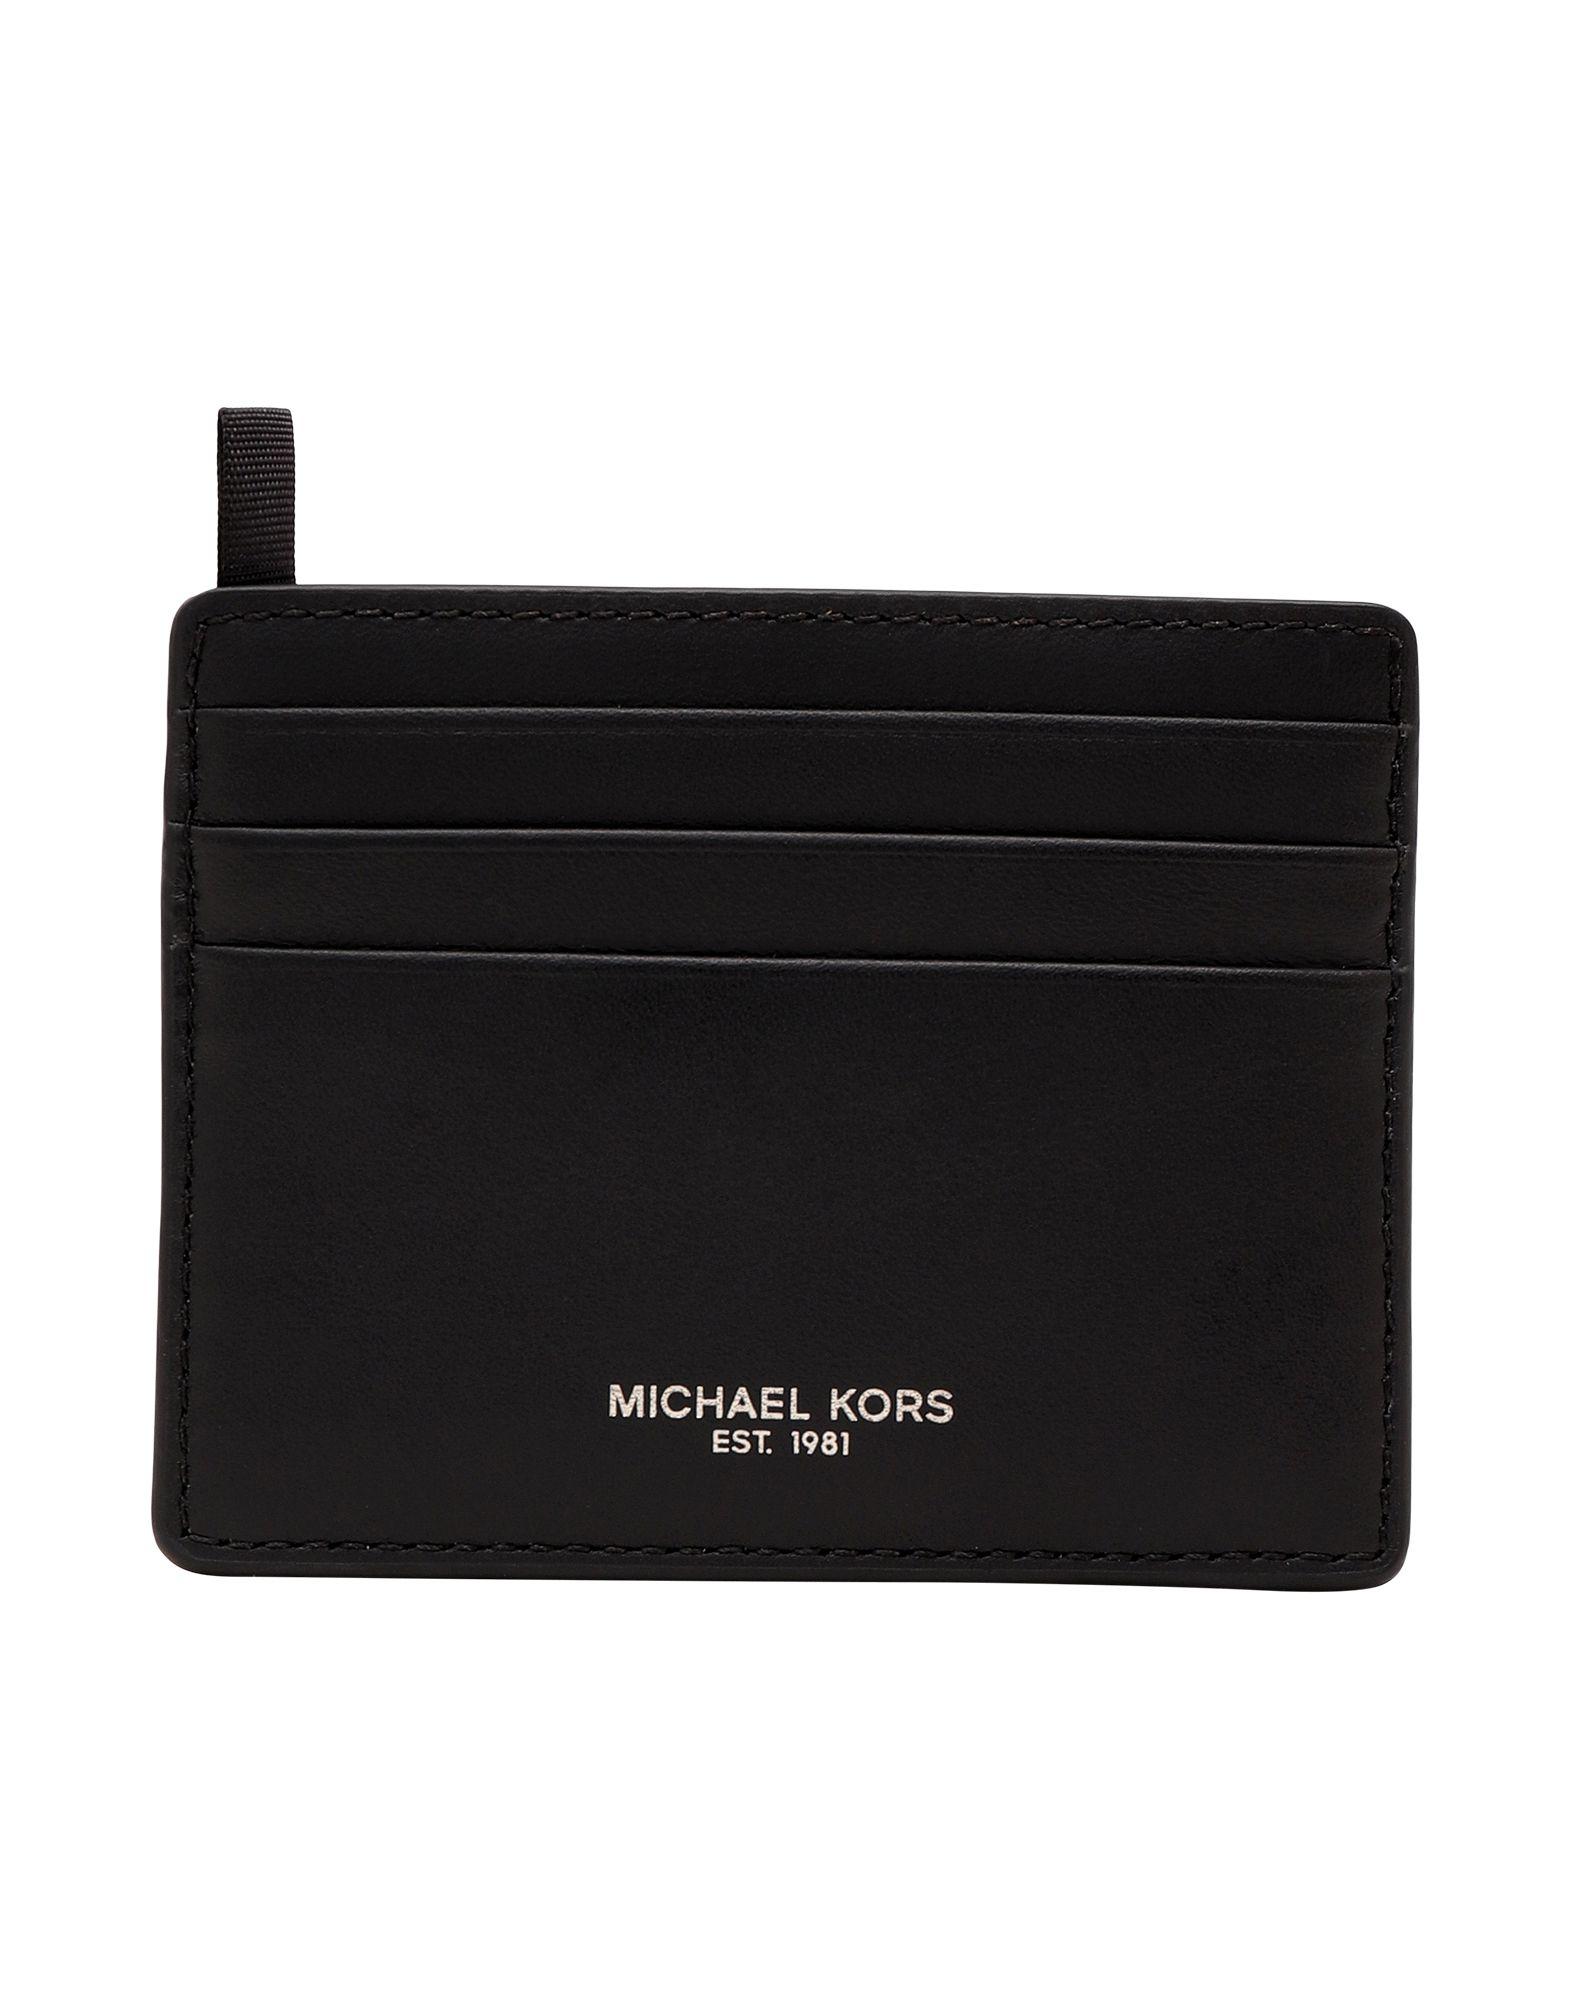 MICHAEL KORS MENS Чехол для документов michael kors чехол с золотистыми точками для iphone 7 8